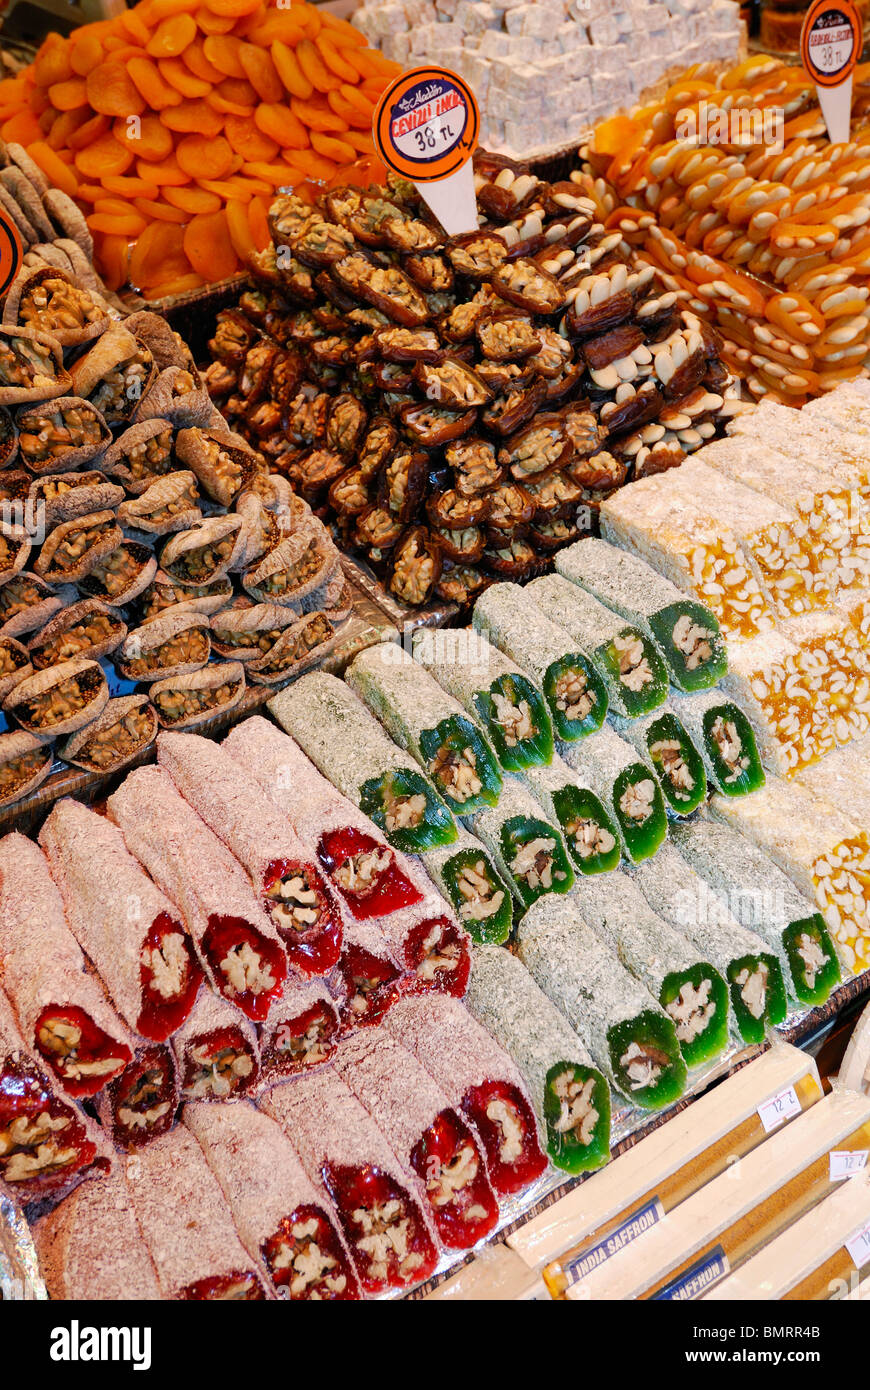 Istanbul. Turkey. Sweets & Turkish Delight (Lokum) at the Spice Bazaar aka Egyptian Bazaar. - Stock Image